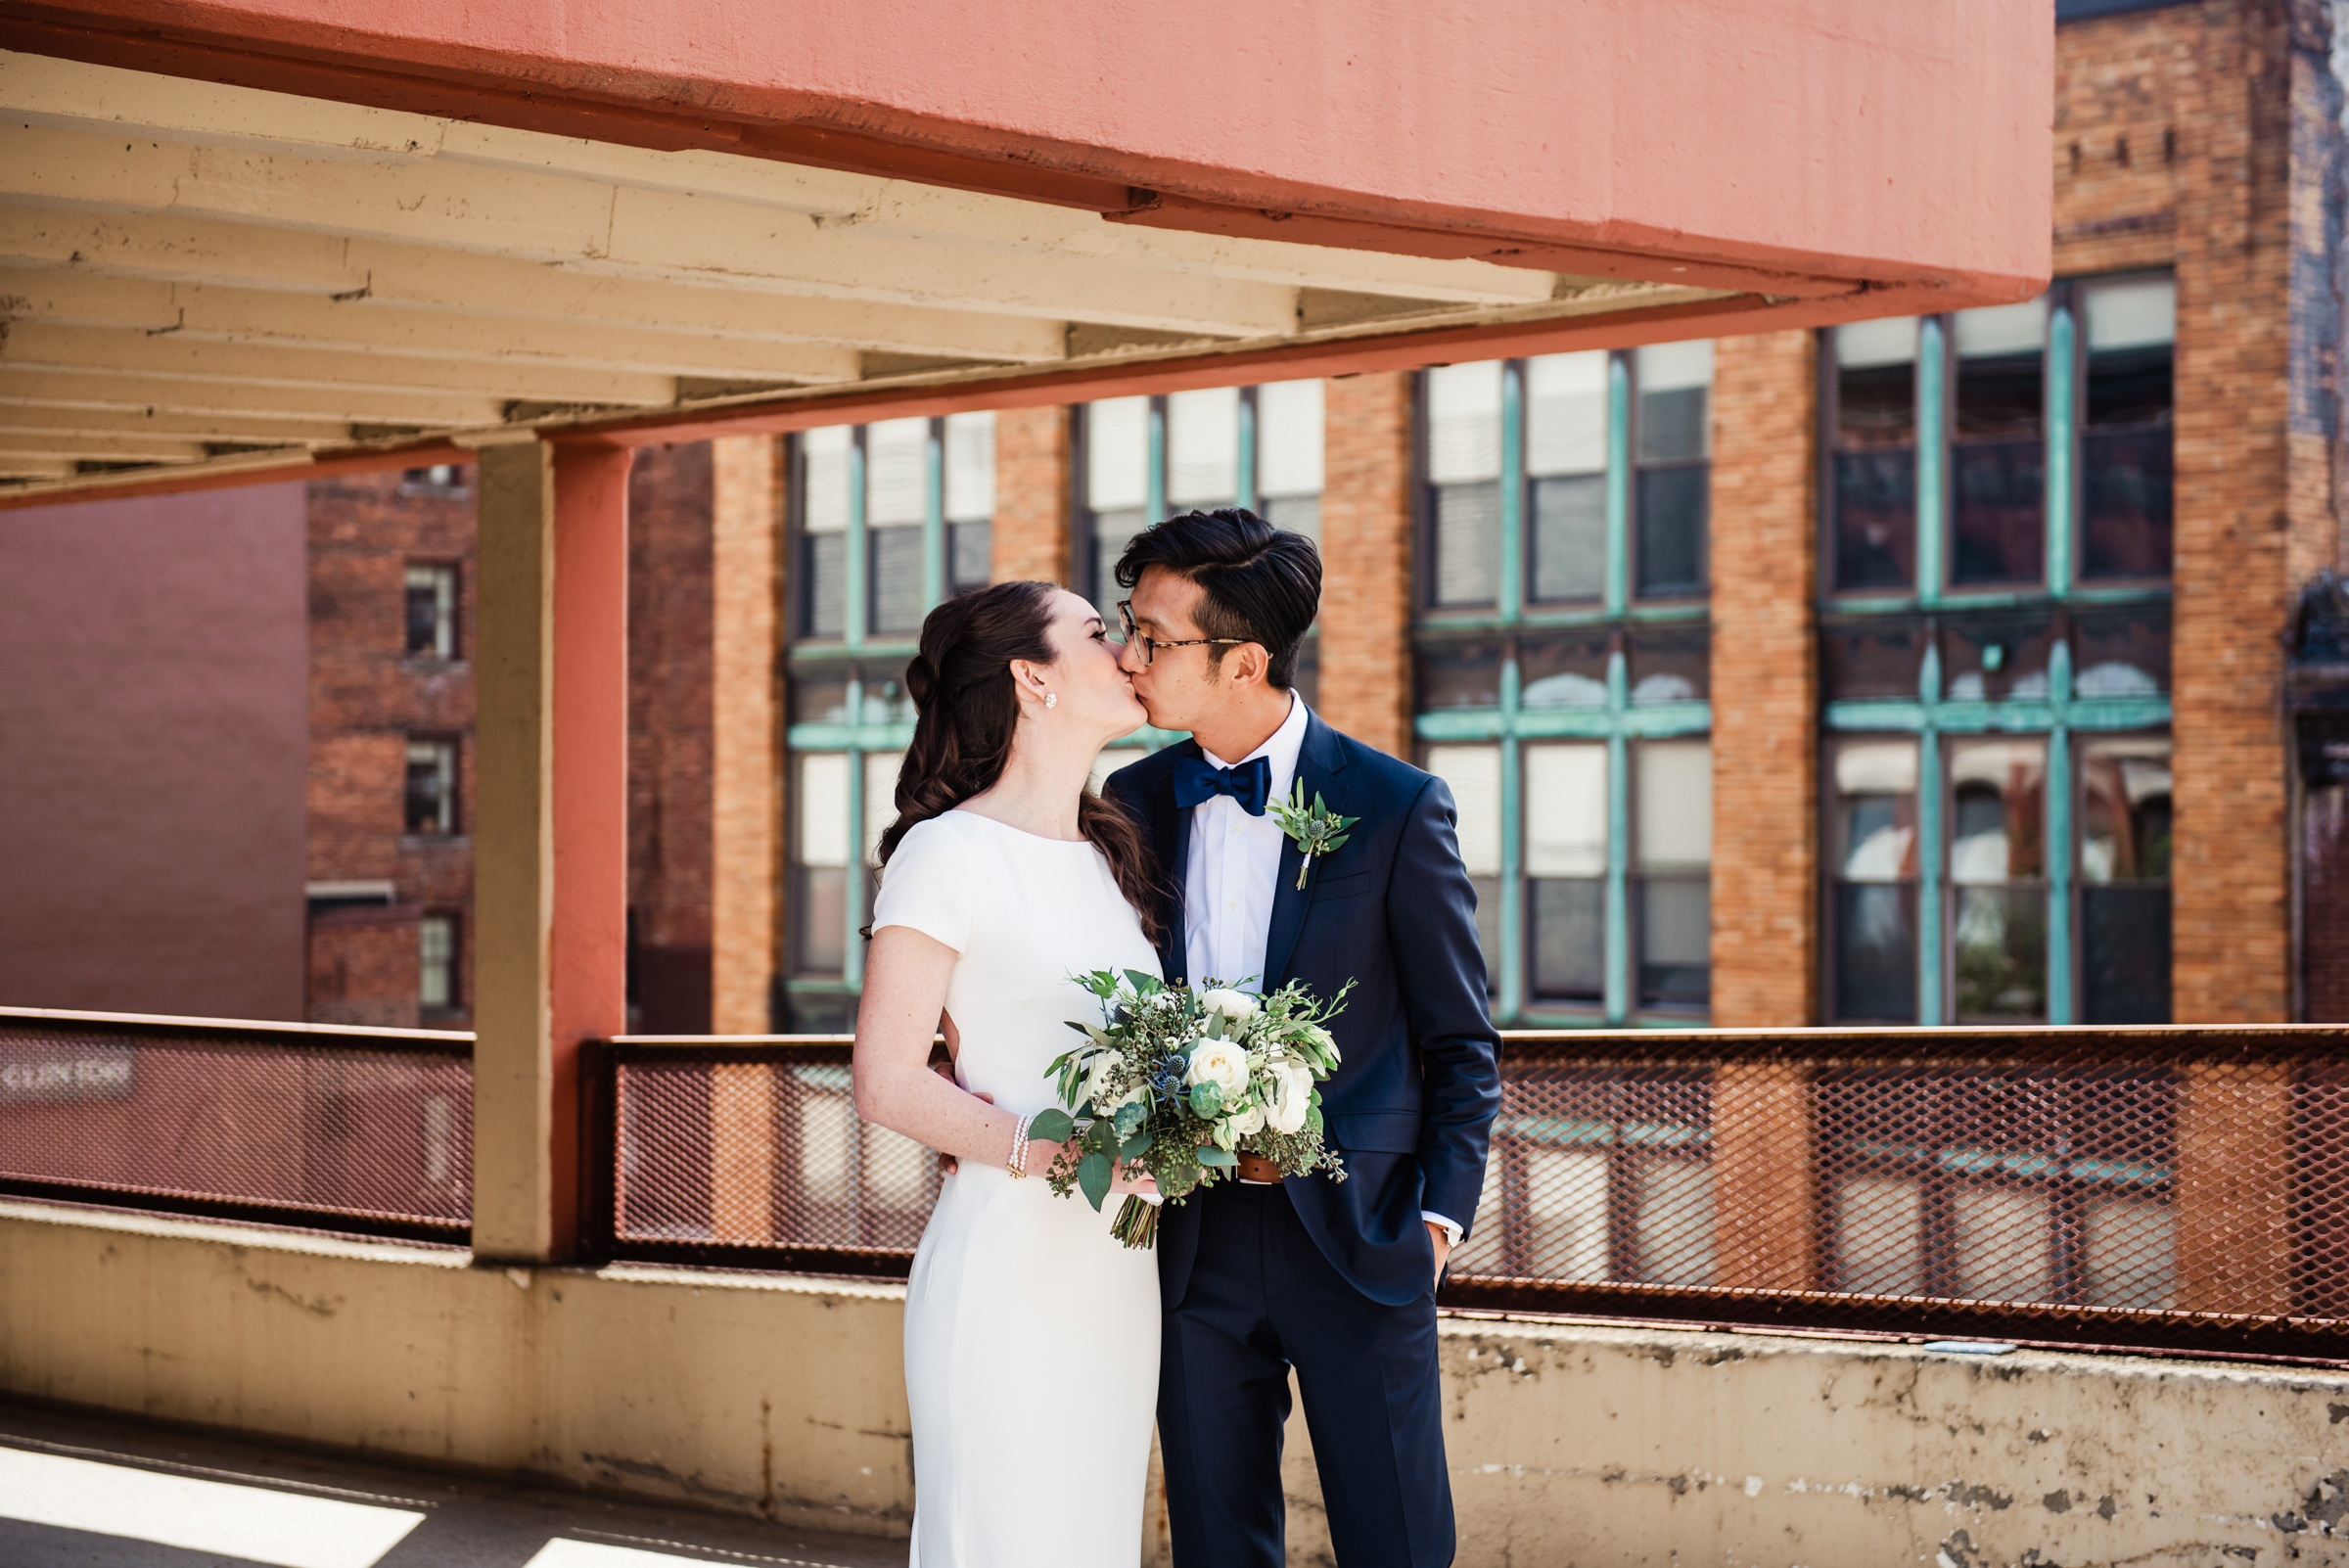 SKY_Armory_Syracuse_Wedding_JILL_STUDIO_Rochester_NY_Photographer_DSC_5229.jpg